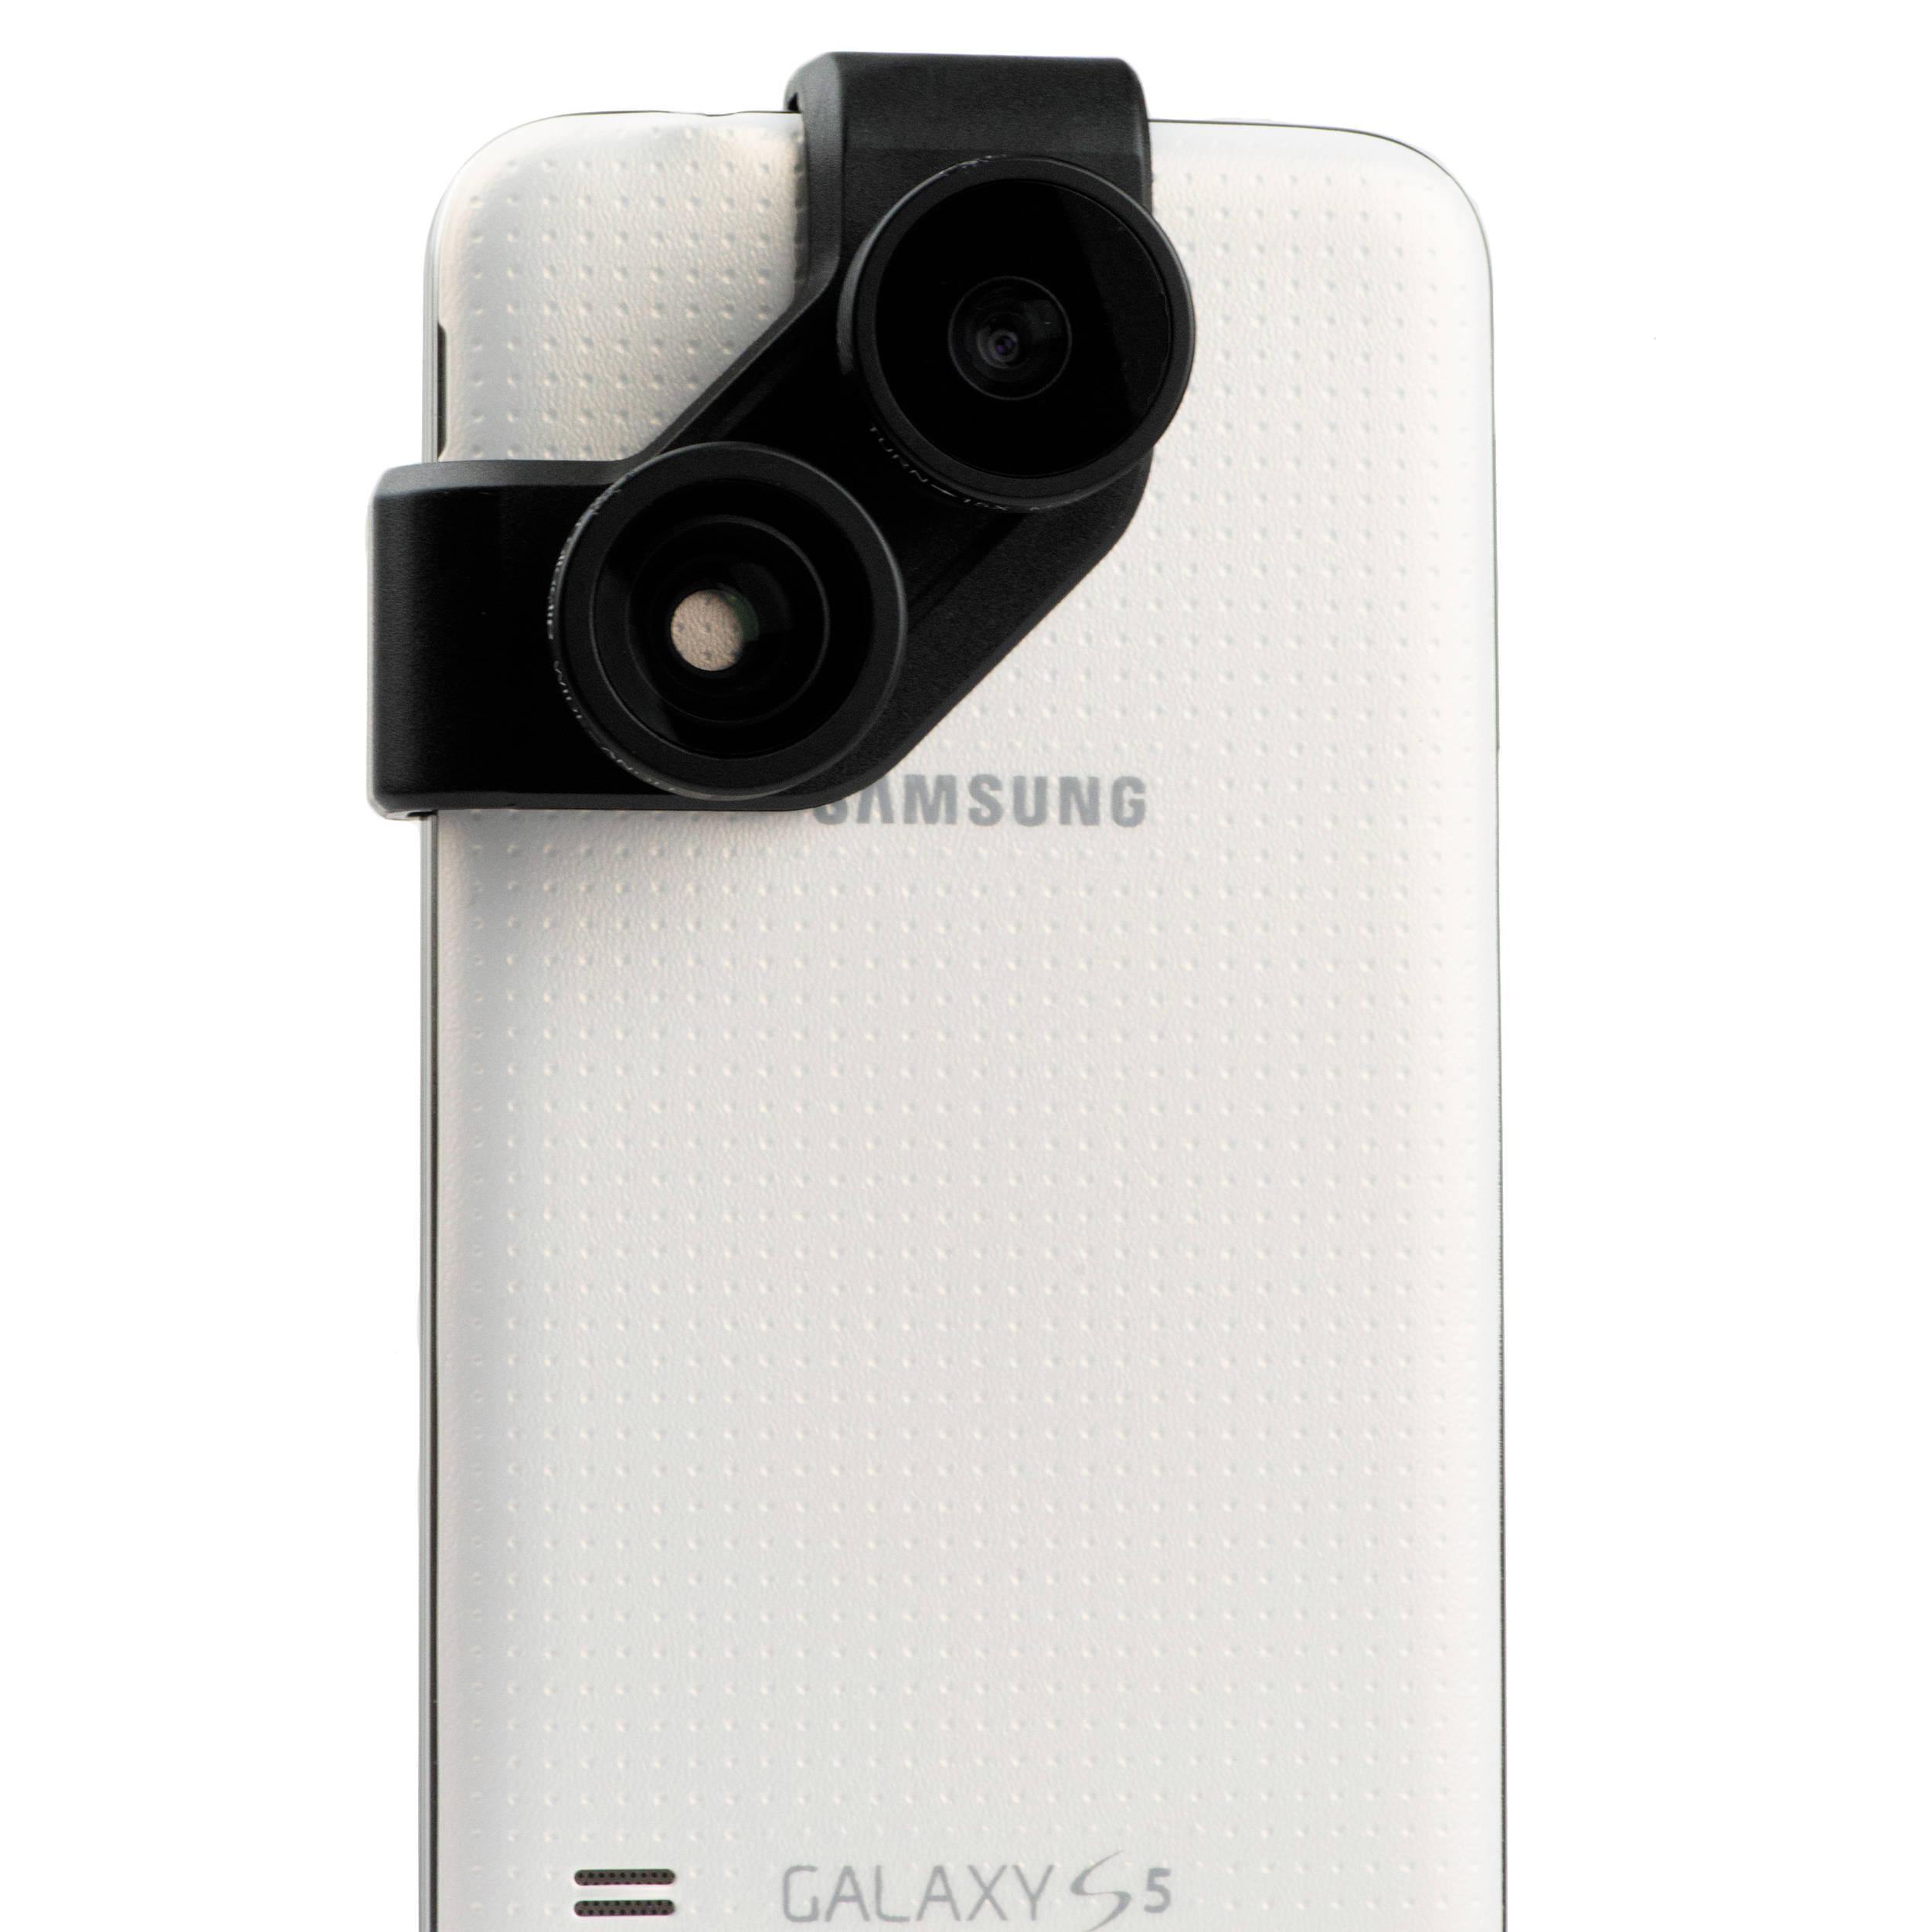 olloclip 4-in-1 Photo Lens for Samsung Galaxy S5 (Black Lens Black Clip) ffdf01d5d06